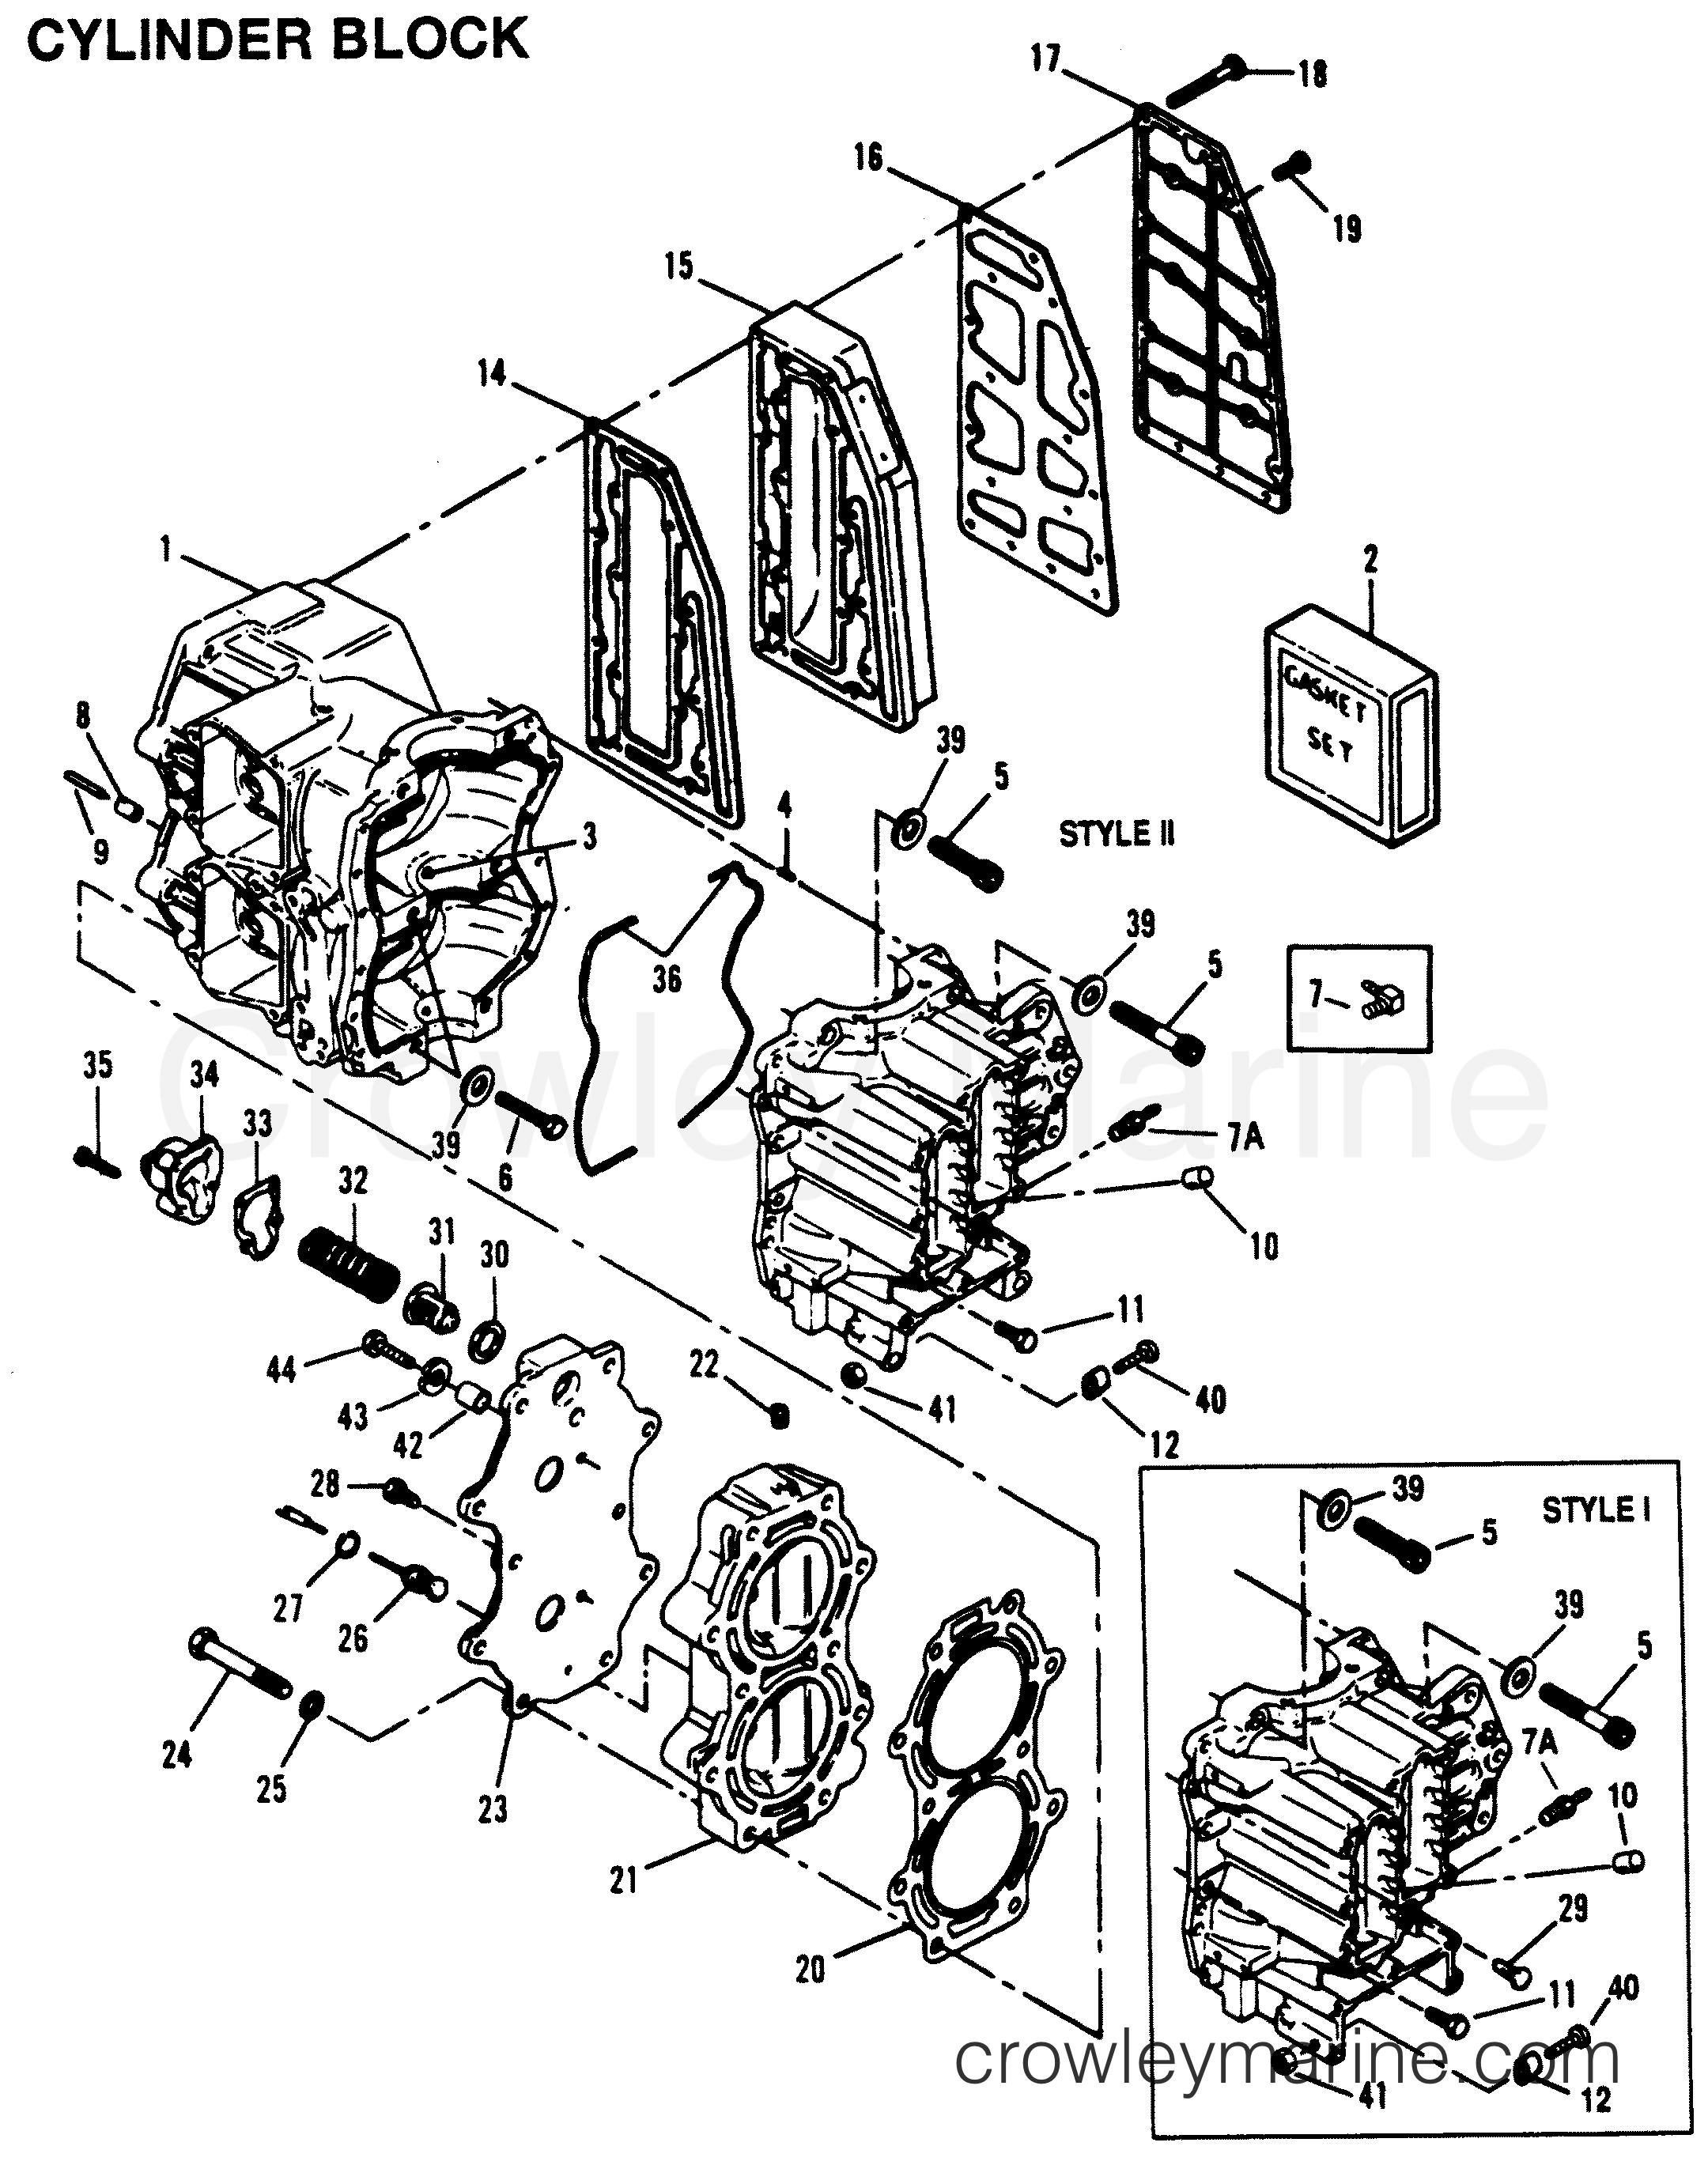 cylinder block